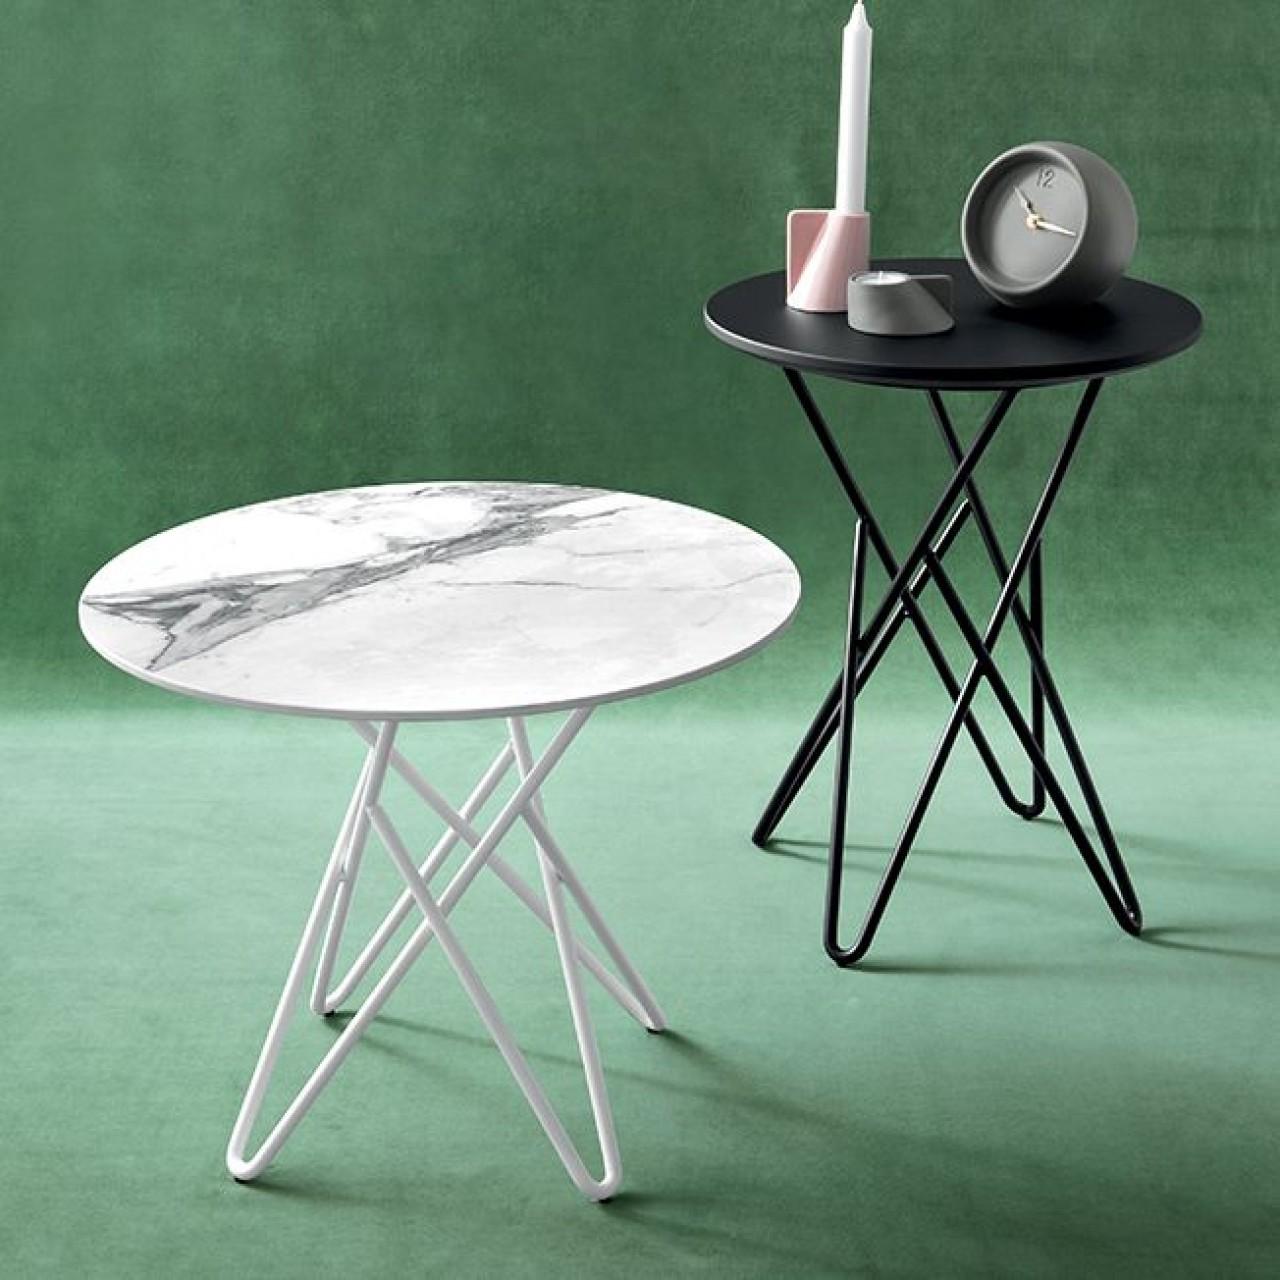 Stellar tavolino fisso complementi d 39 arredo torino for Complementi arredo torino